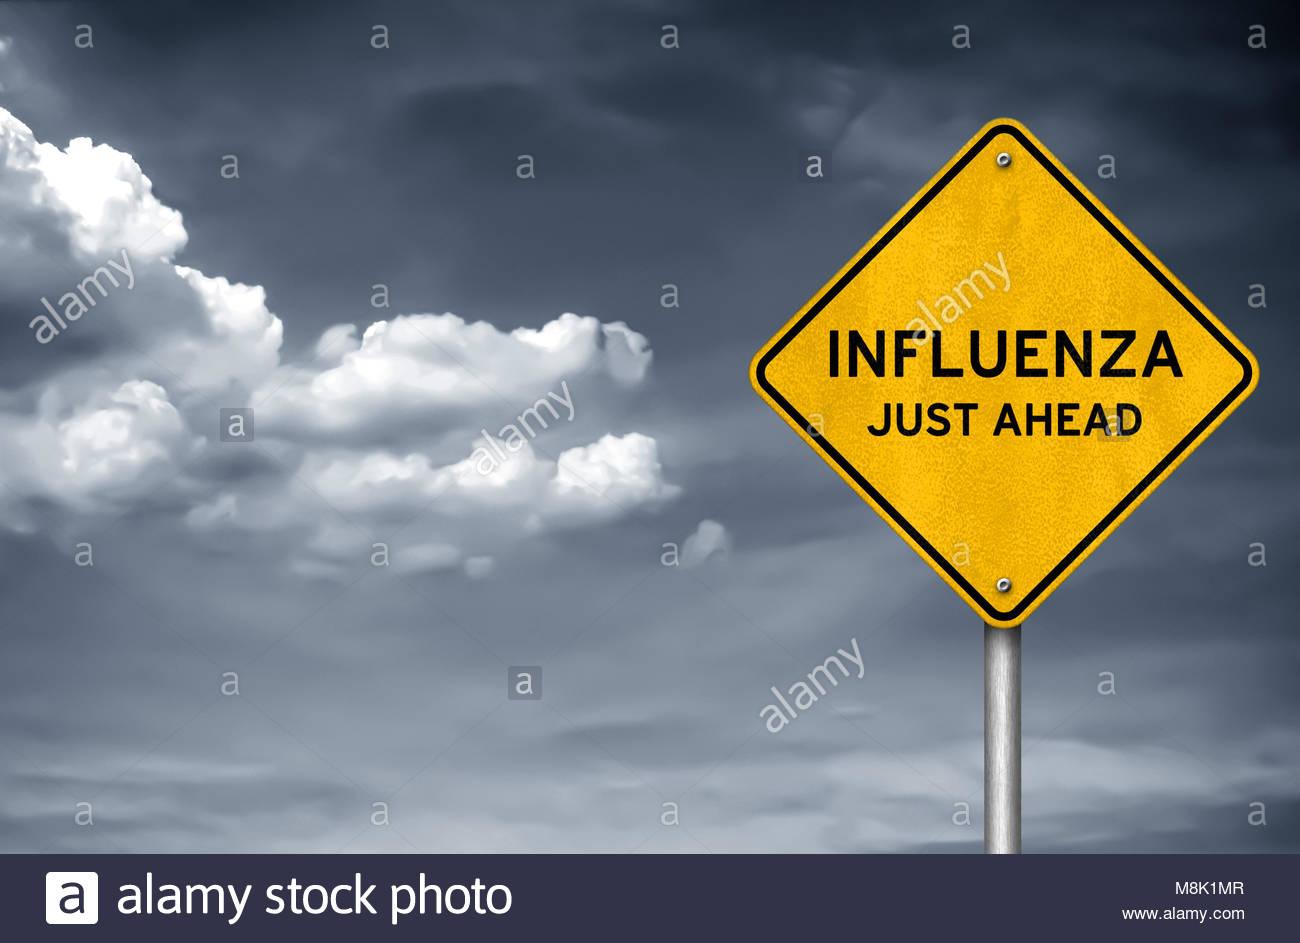 INFLUENZA - just ahead - Stock Image